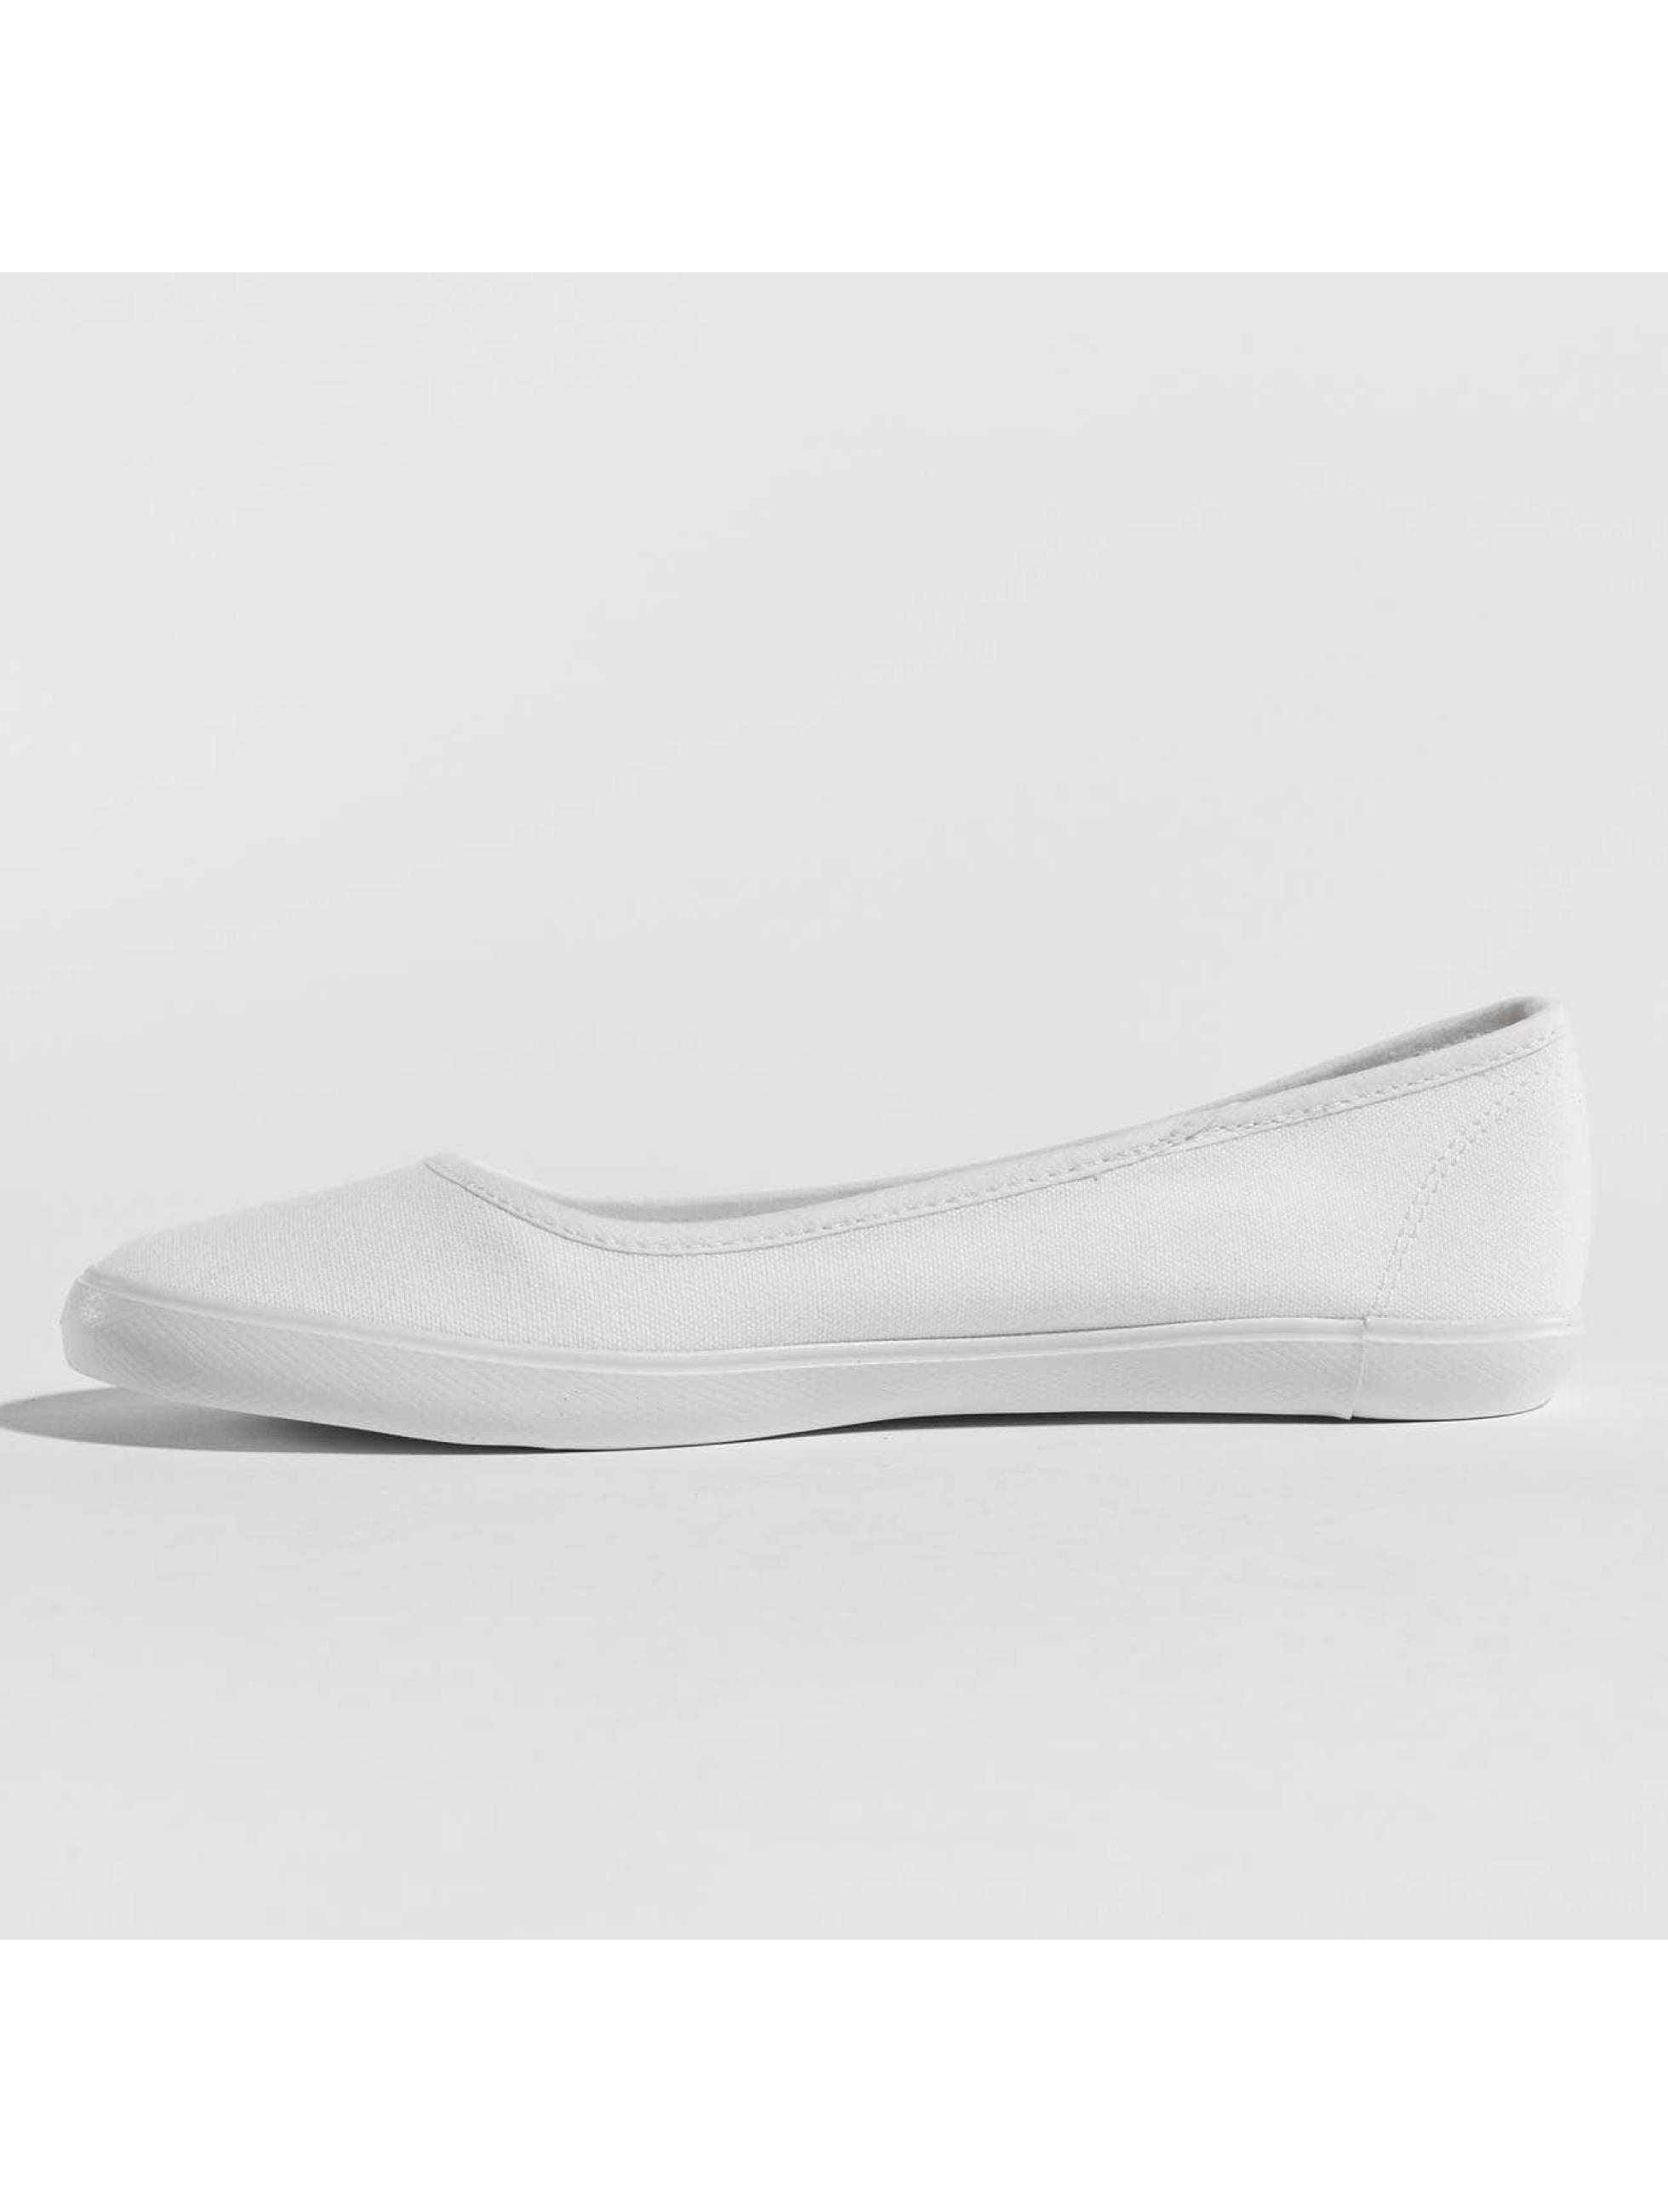 Lacoste Ballerinas Marthe BL 1 SPW white